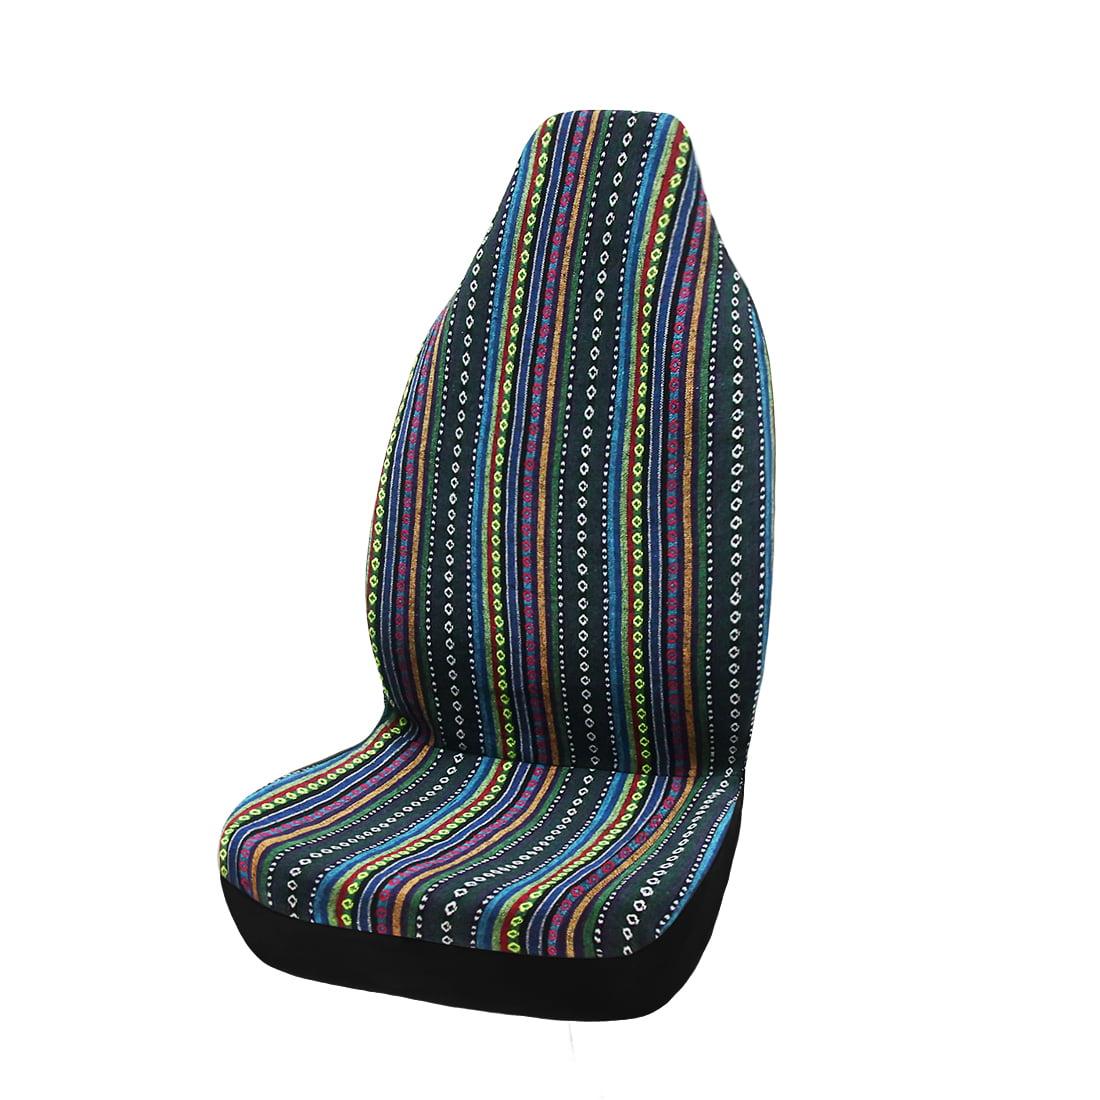 2 pcs Baja Blanket Universal Bucket Seat Cover For Car Truck SUV